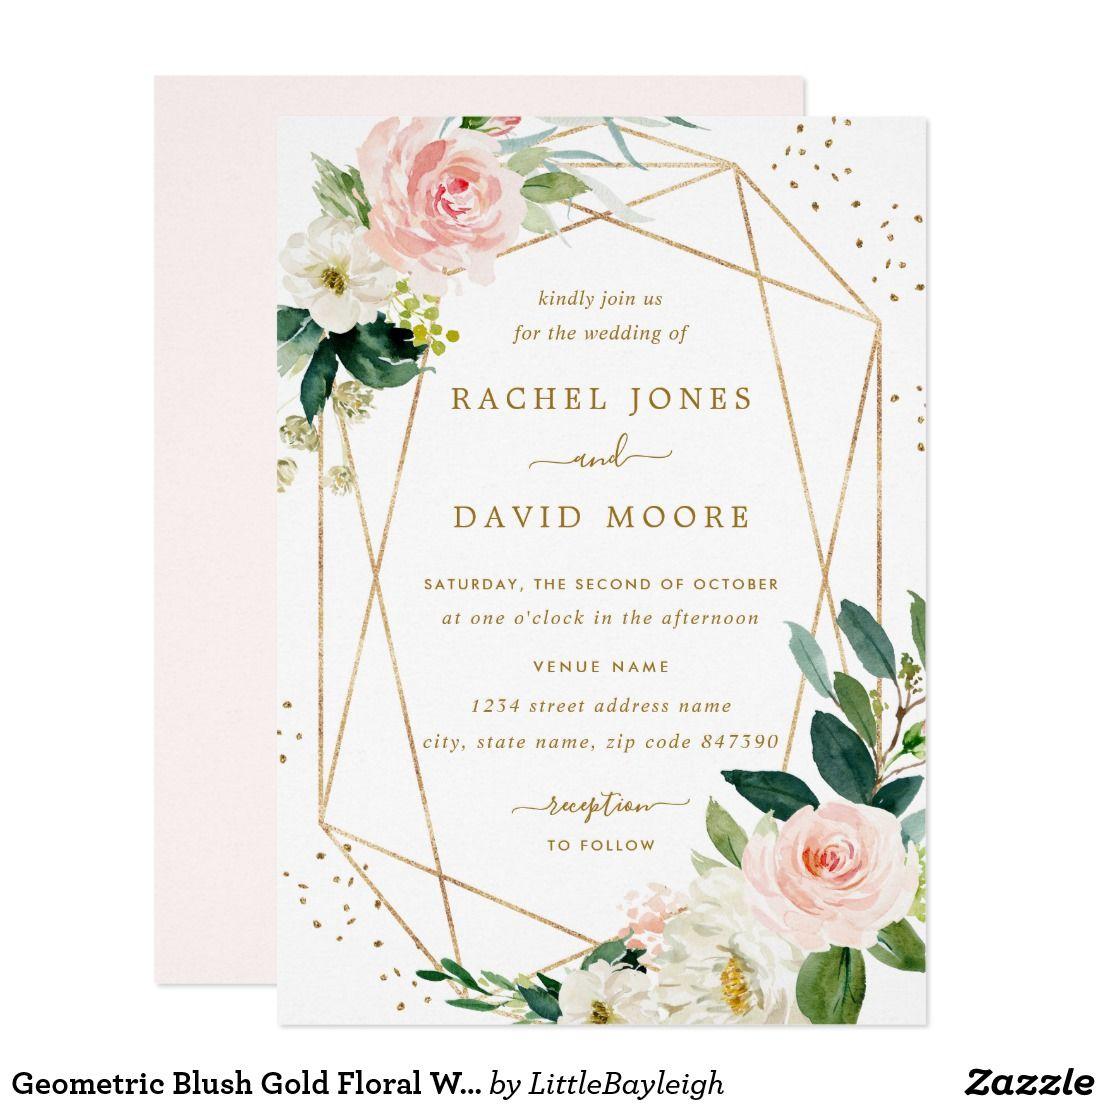 Geometric Blush Gold Floral Wedding Invitation Zazzle Com Floral Wedding Invitations Bubbly Bridal Shower Modern Floral Wedding Invitations